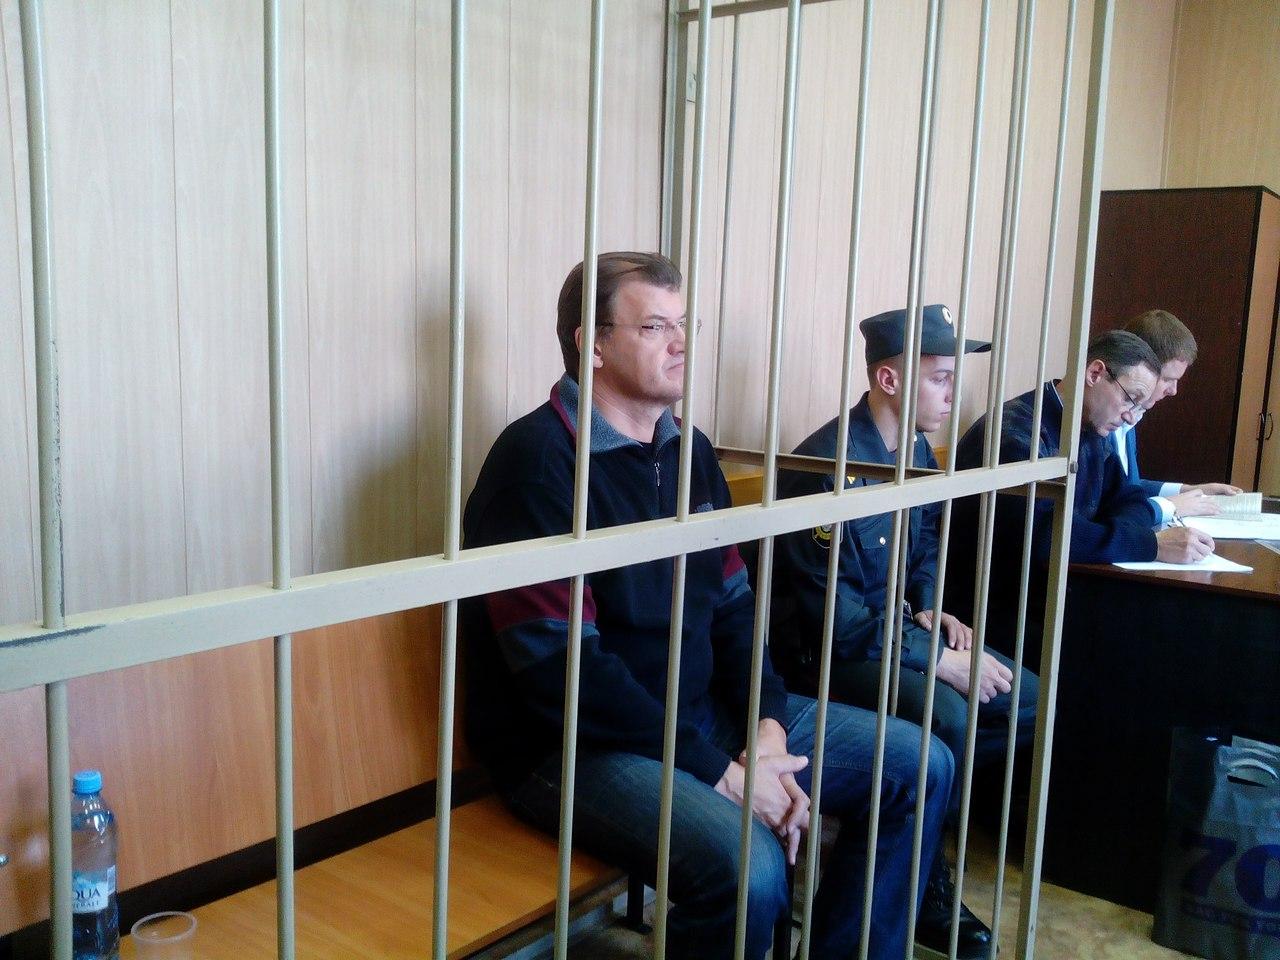 Суд продлил домашний арест экс-мэра Николая Николайчука до 22 октября